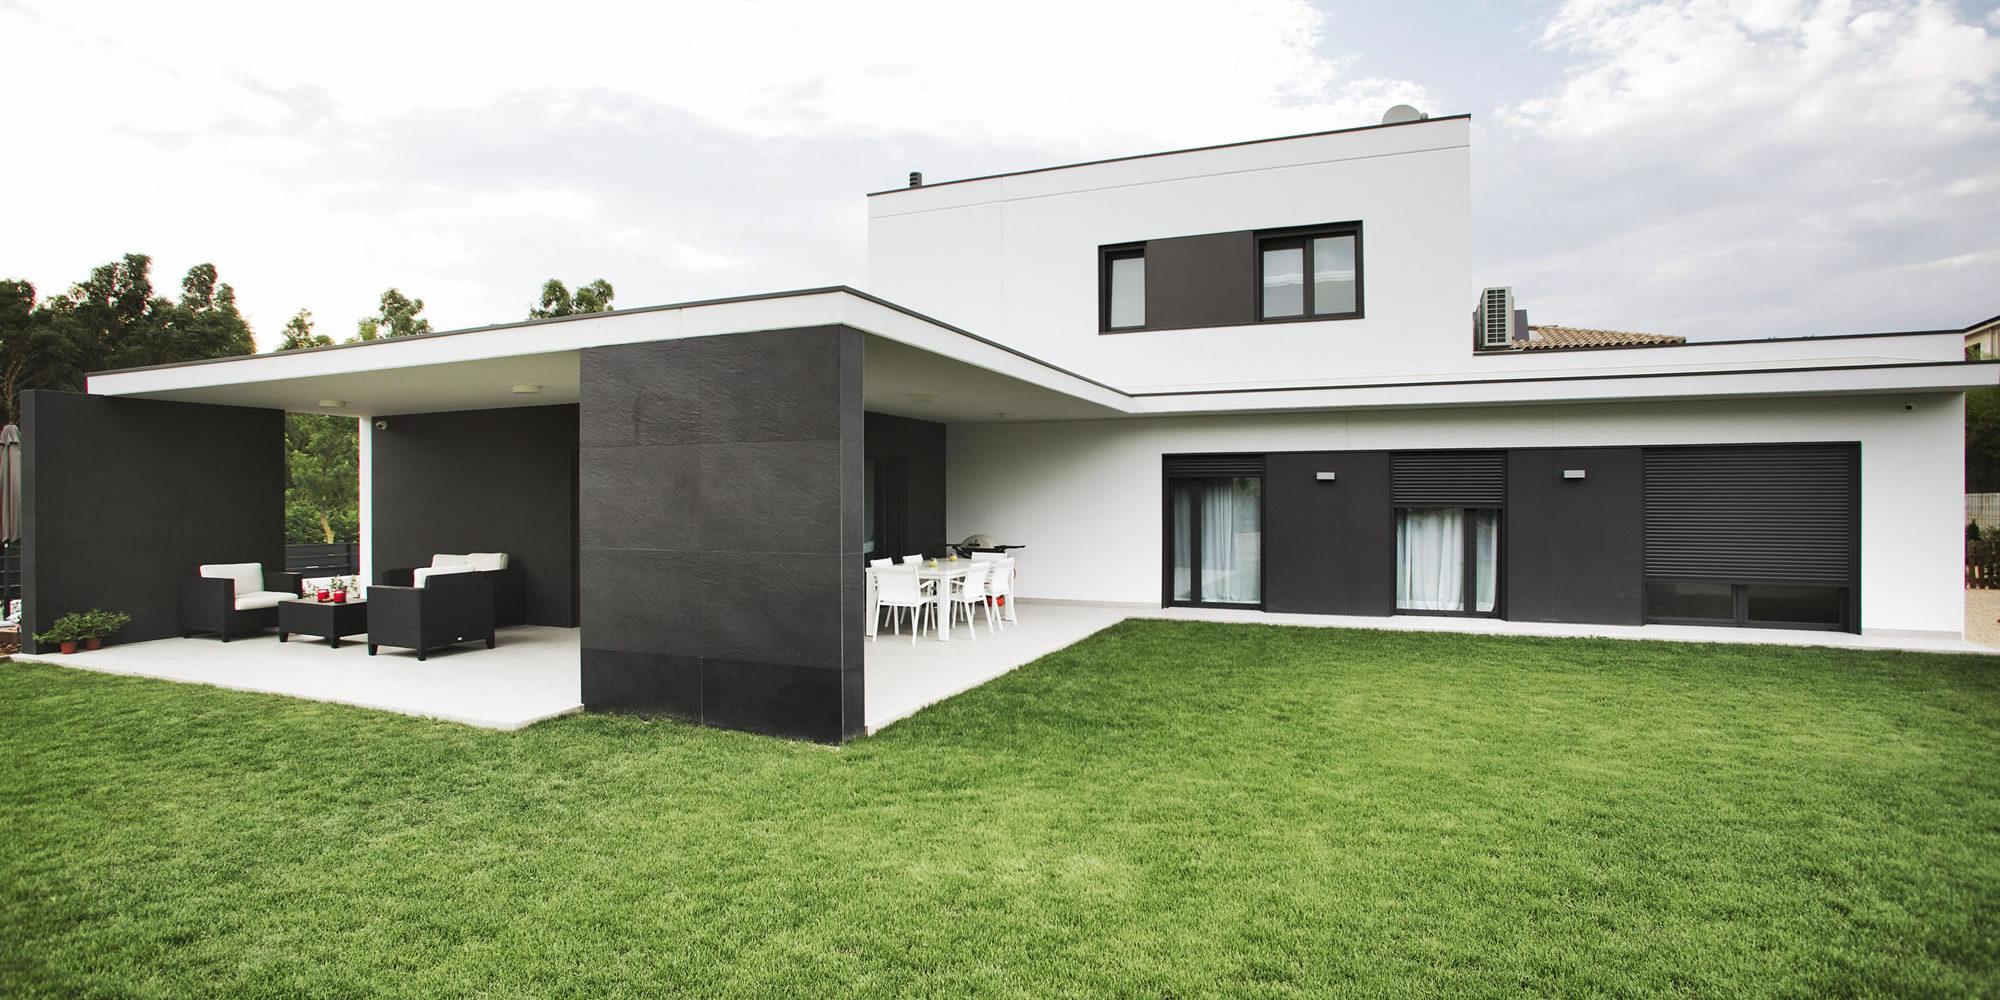 Casa girona 2 casas prefabricadas de hormig n hormipresa - Casas prefabricadas girona ...